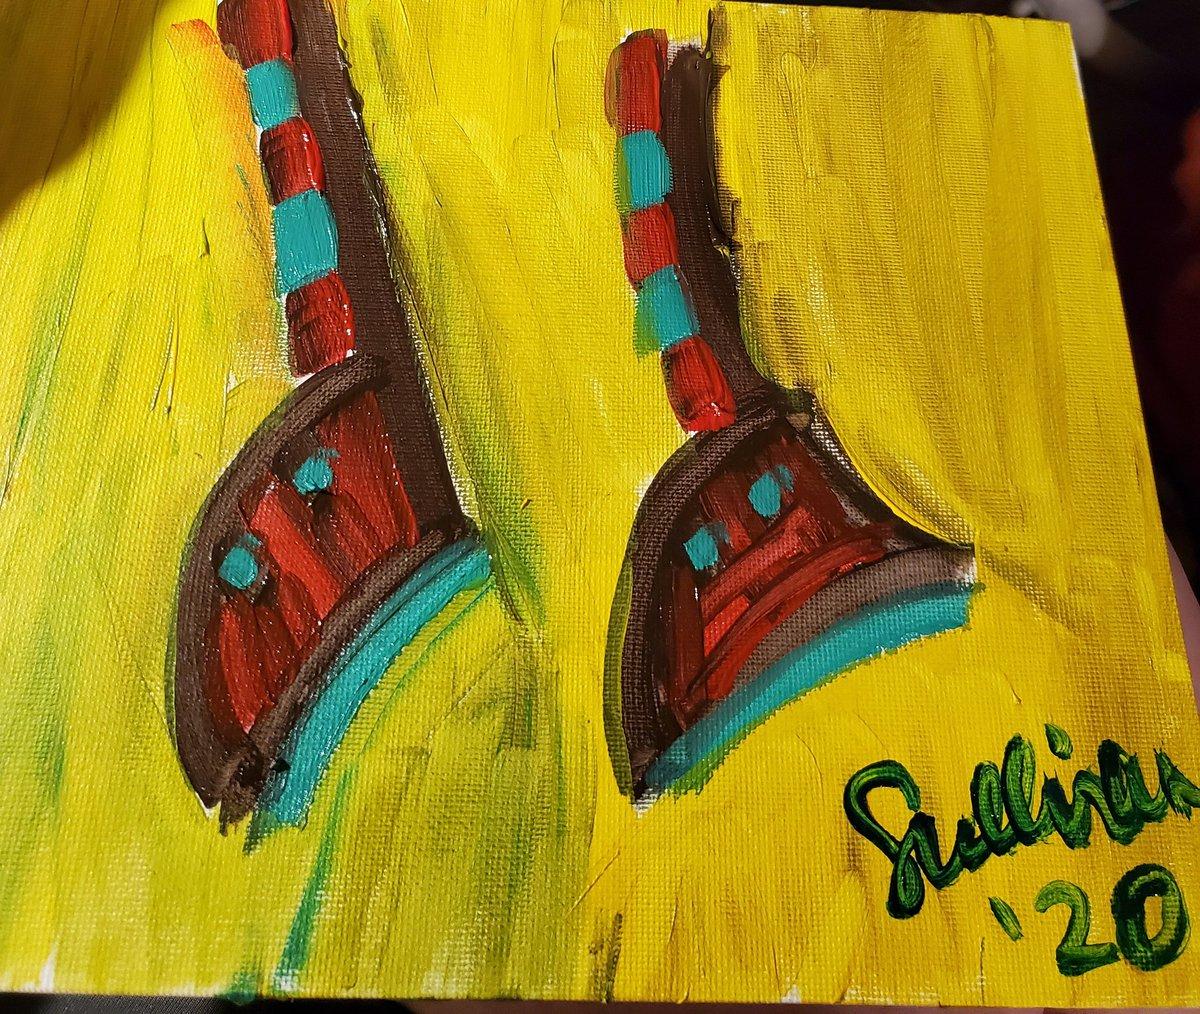 @bri7095 #erindsullivanart #thomasbsullivanartgalleries #IMPRESSIONISM #PICOFTHEDAY #ABSTRACTART #geometricart #acrylicpainting #modernart #artdecor #smallspaces #revolutionaryart #contemporaryart #northeastlouisianaartist #nofilter #art https://t.co/29oT8p9zGU